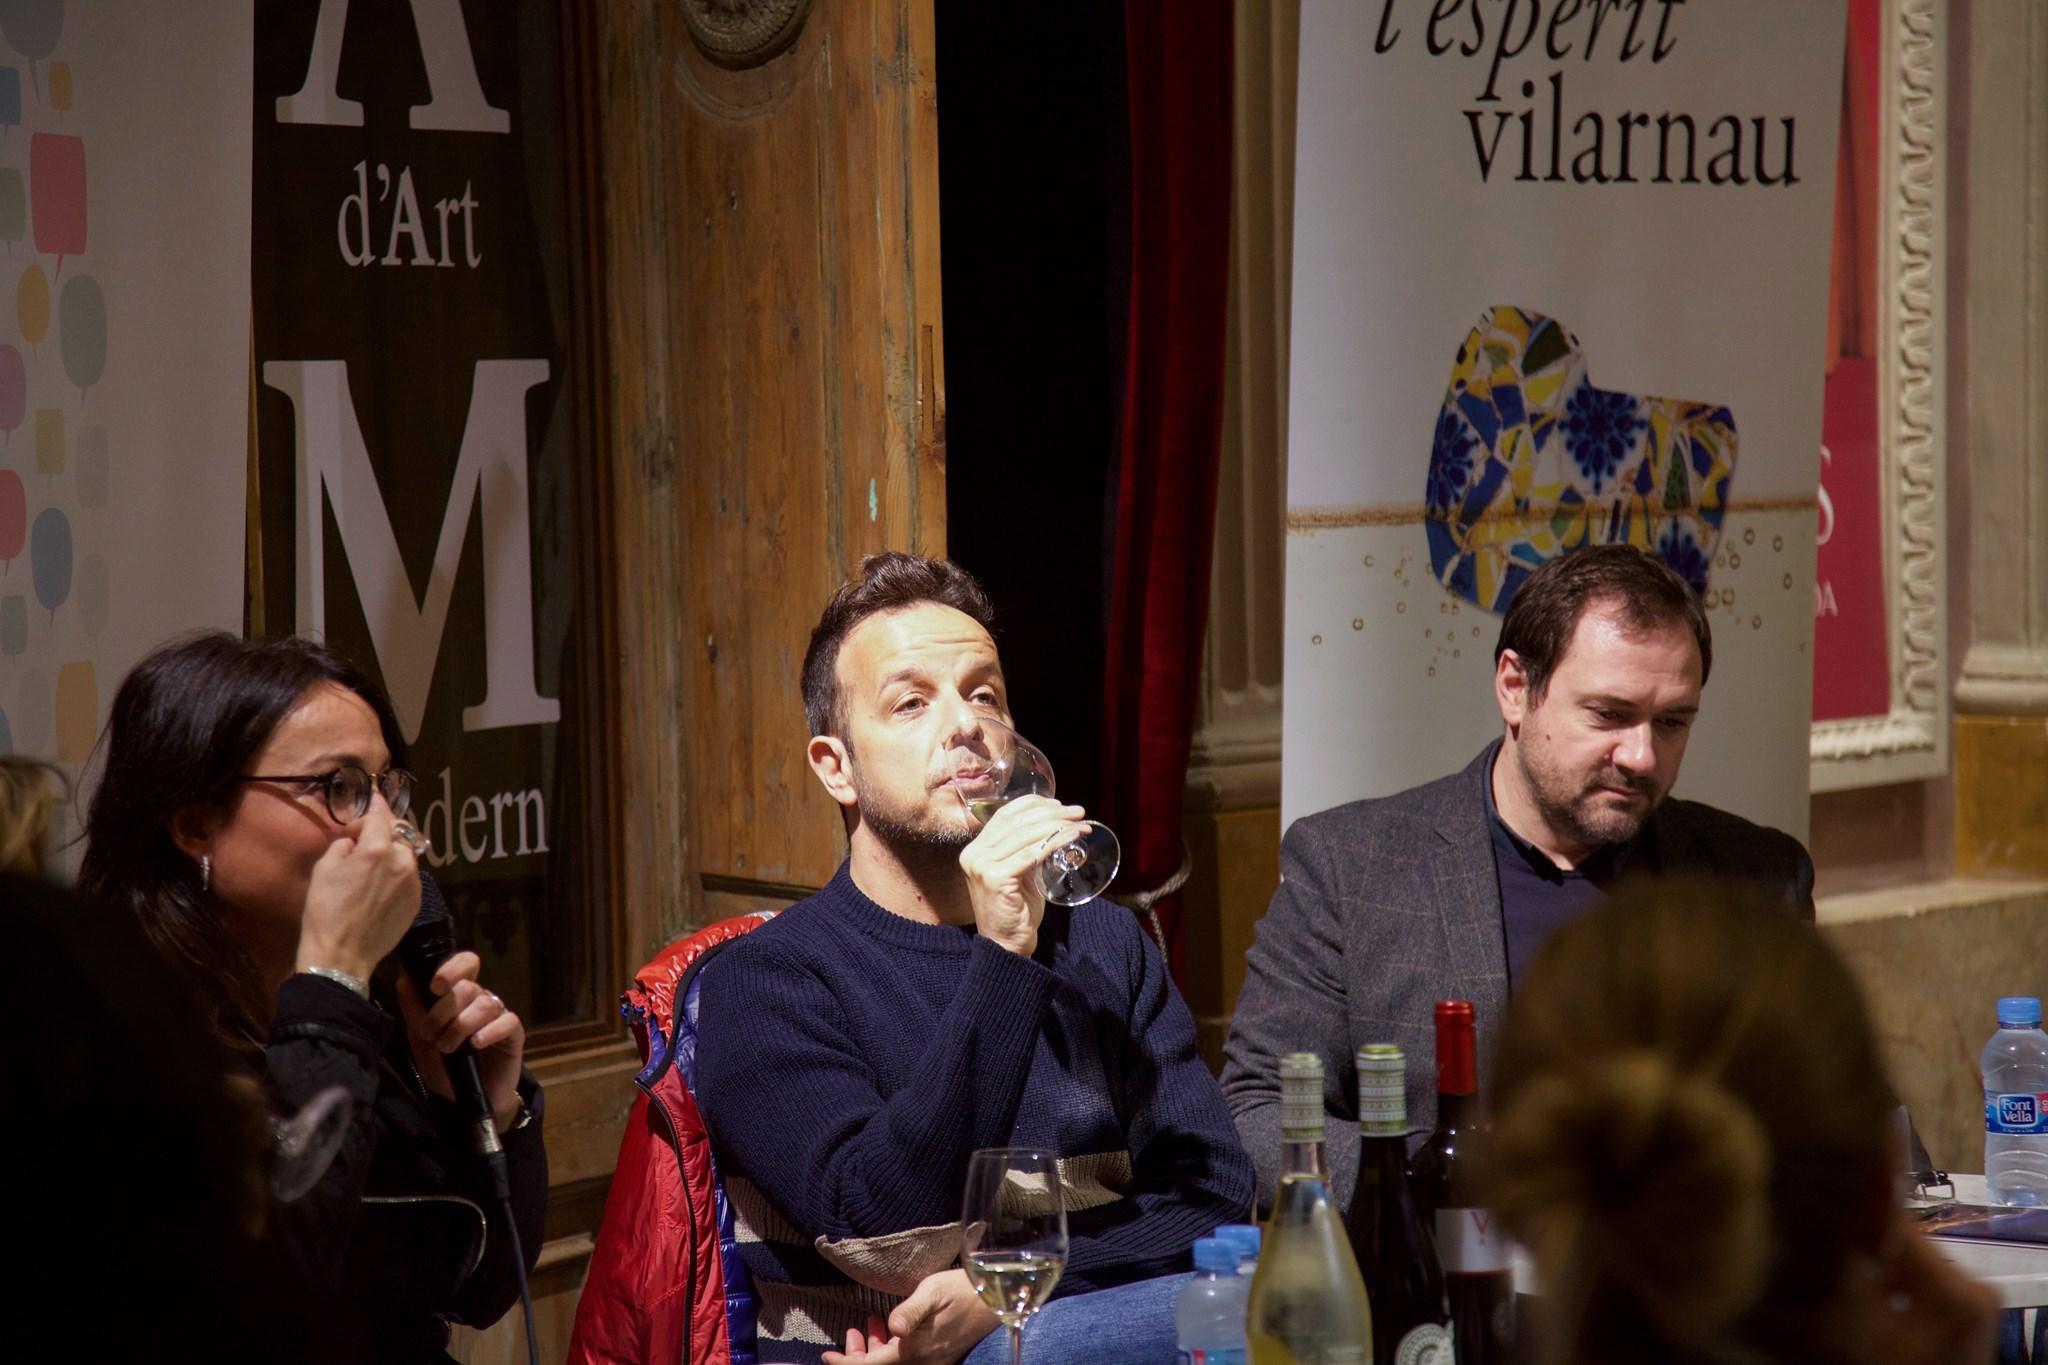 #VisàVis amb Àngel Llàcer i el celler Vilarnau